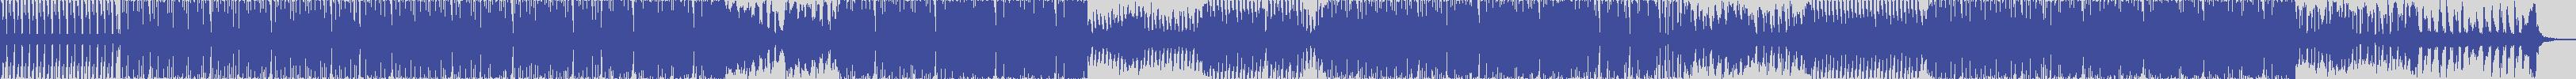 just_digital_records [JS1143] Homeboyz - Crazy Dj [Thunder Axe Mix] audio wave form